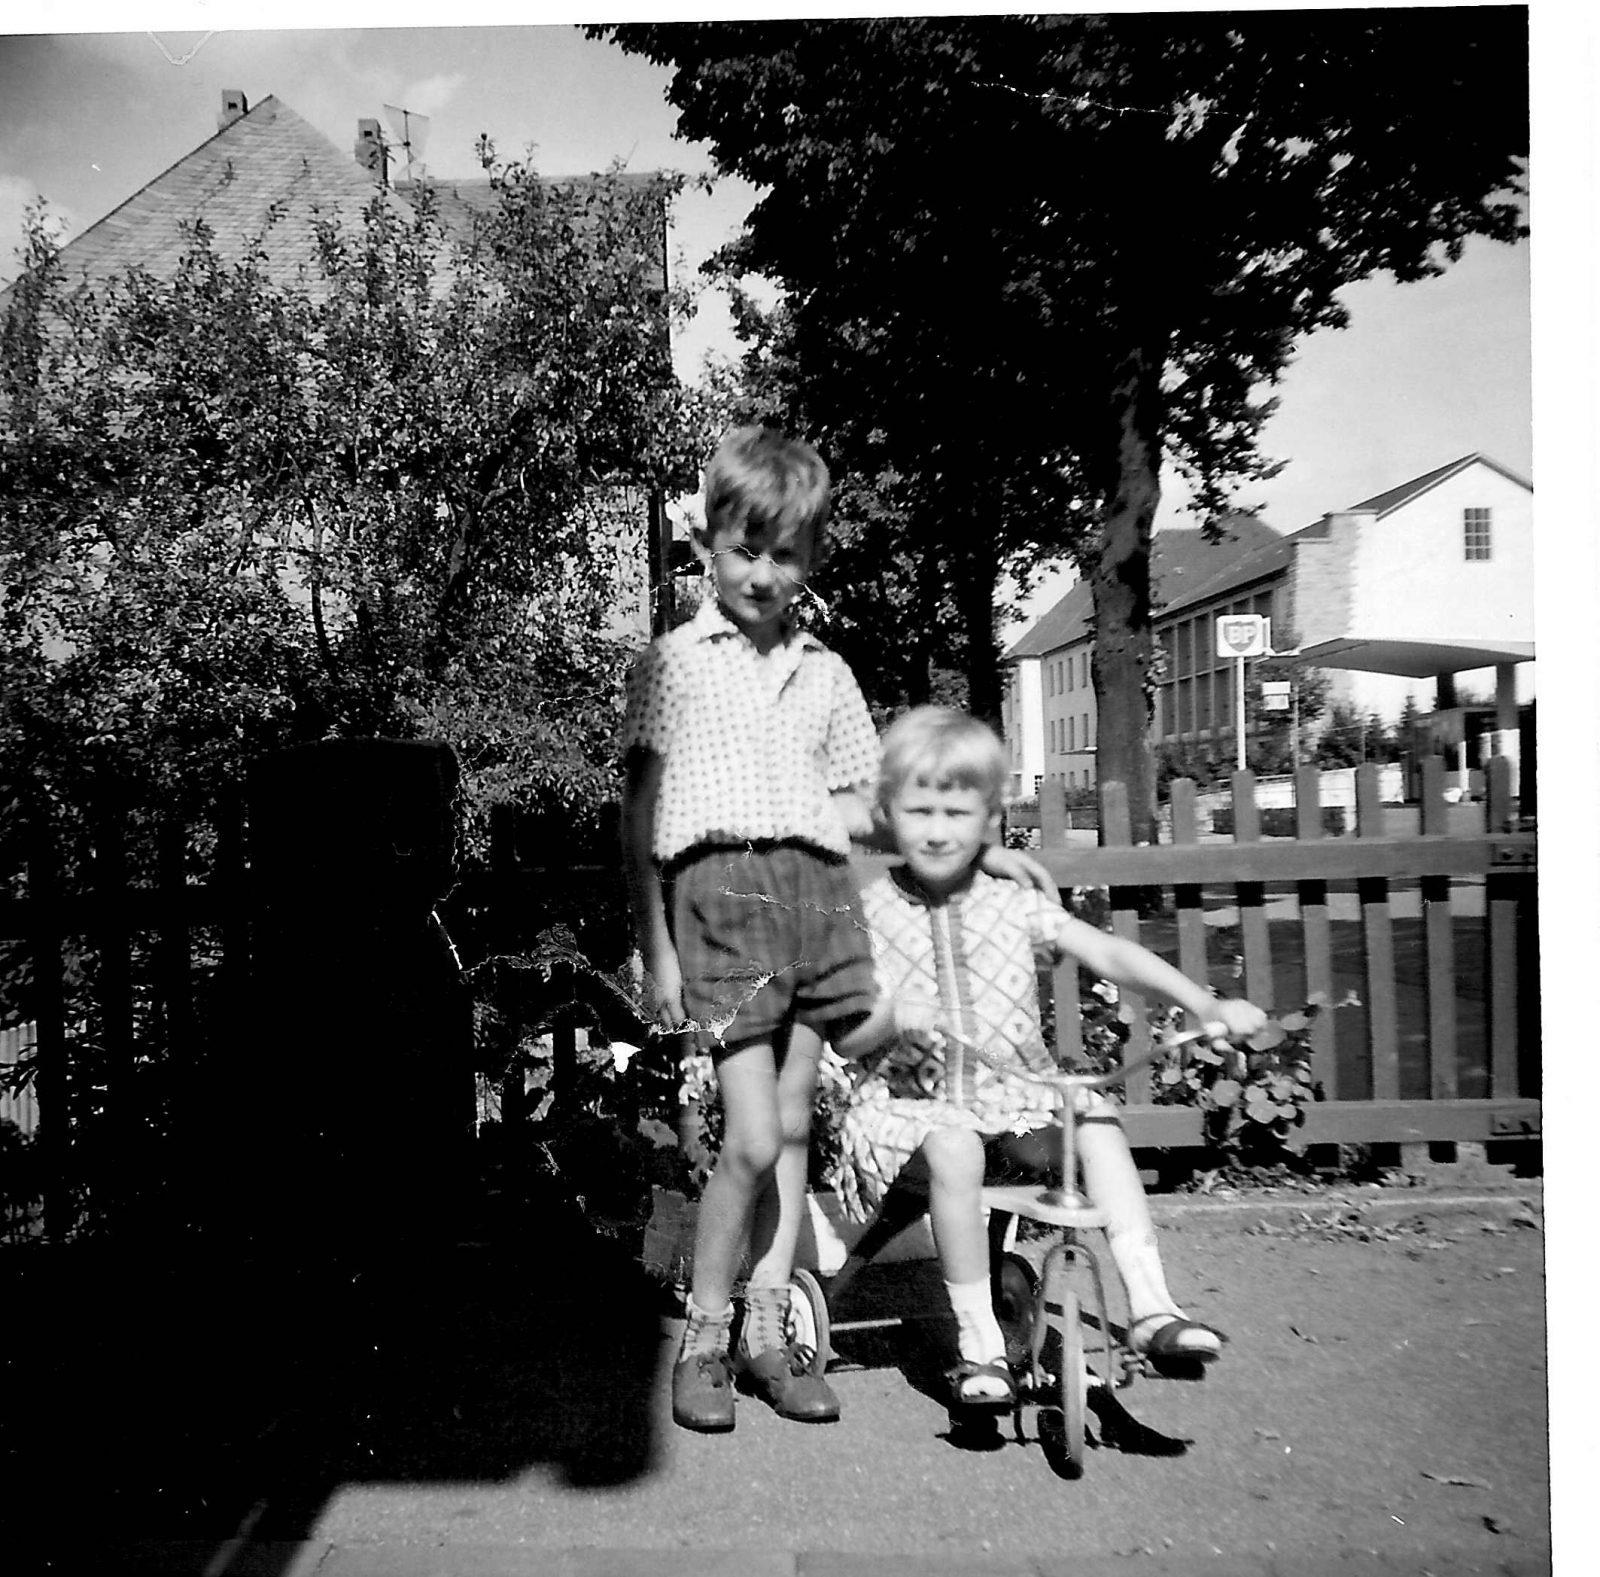 WH 1965 Rai u Bir im Vorgarten